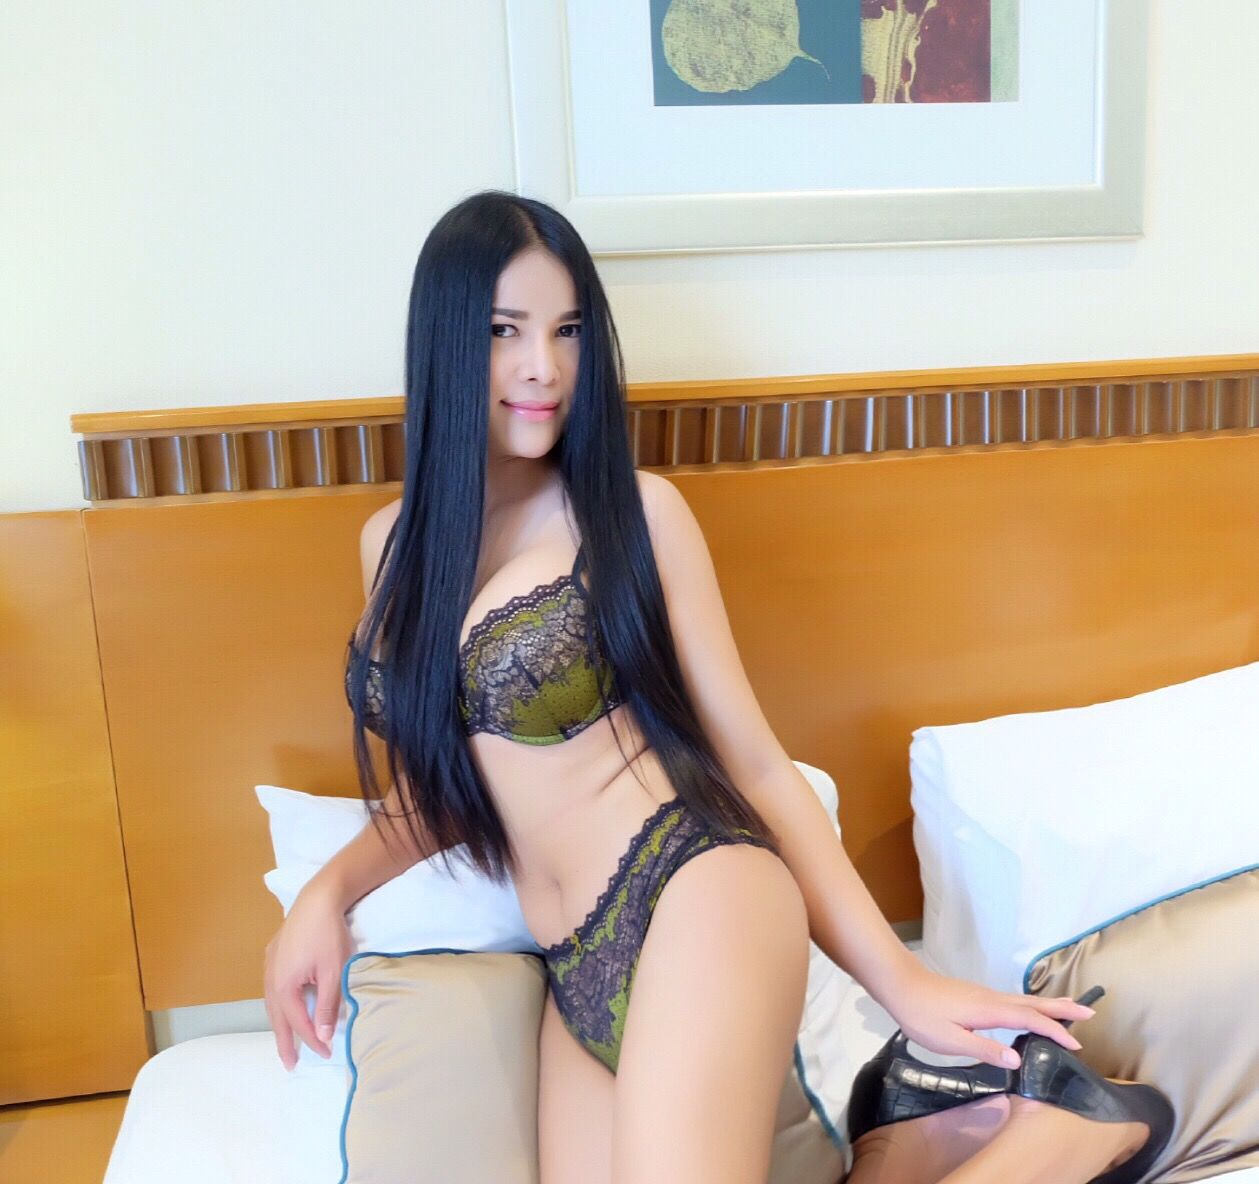 thailand ts escorts free escort service